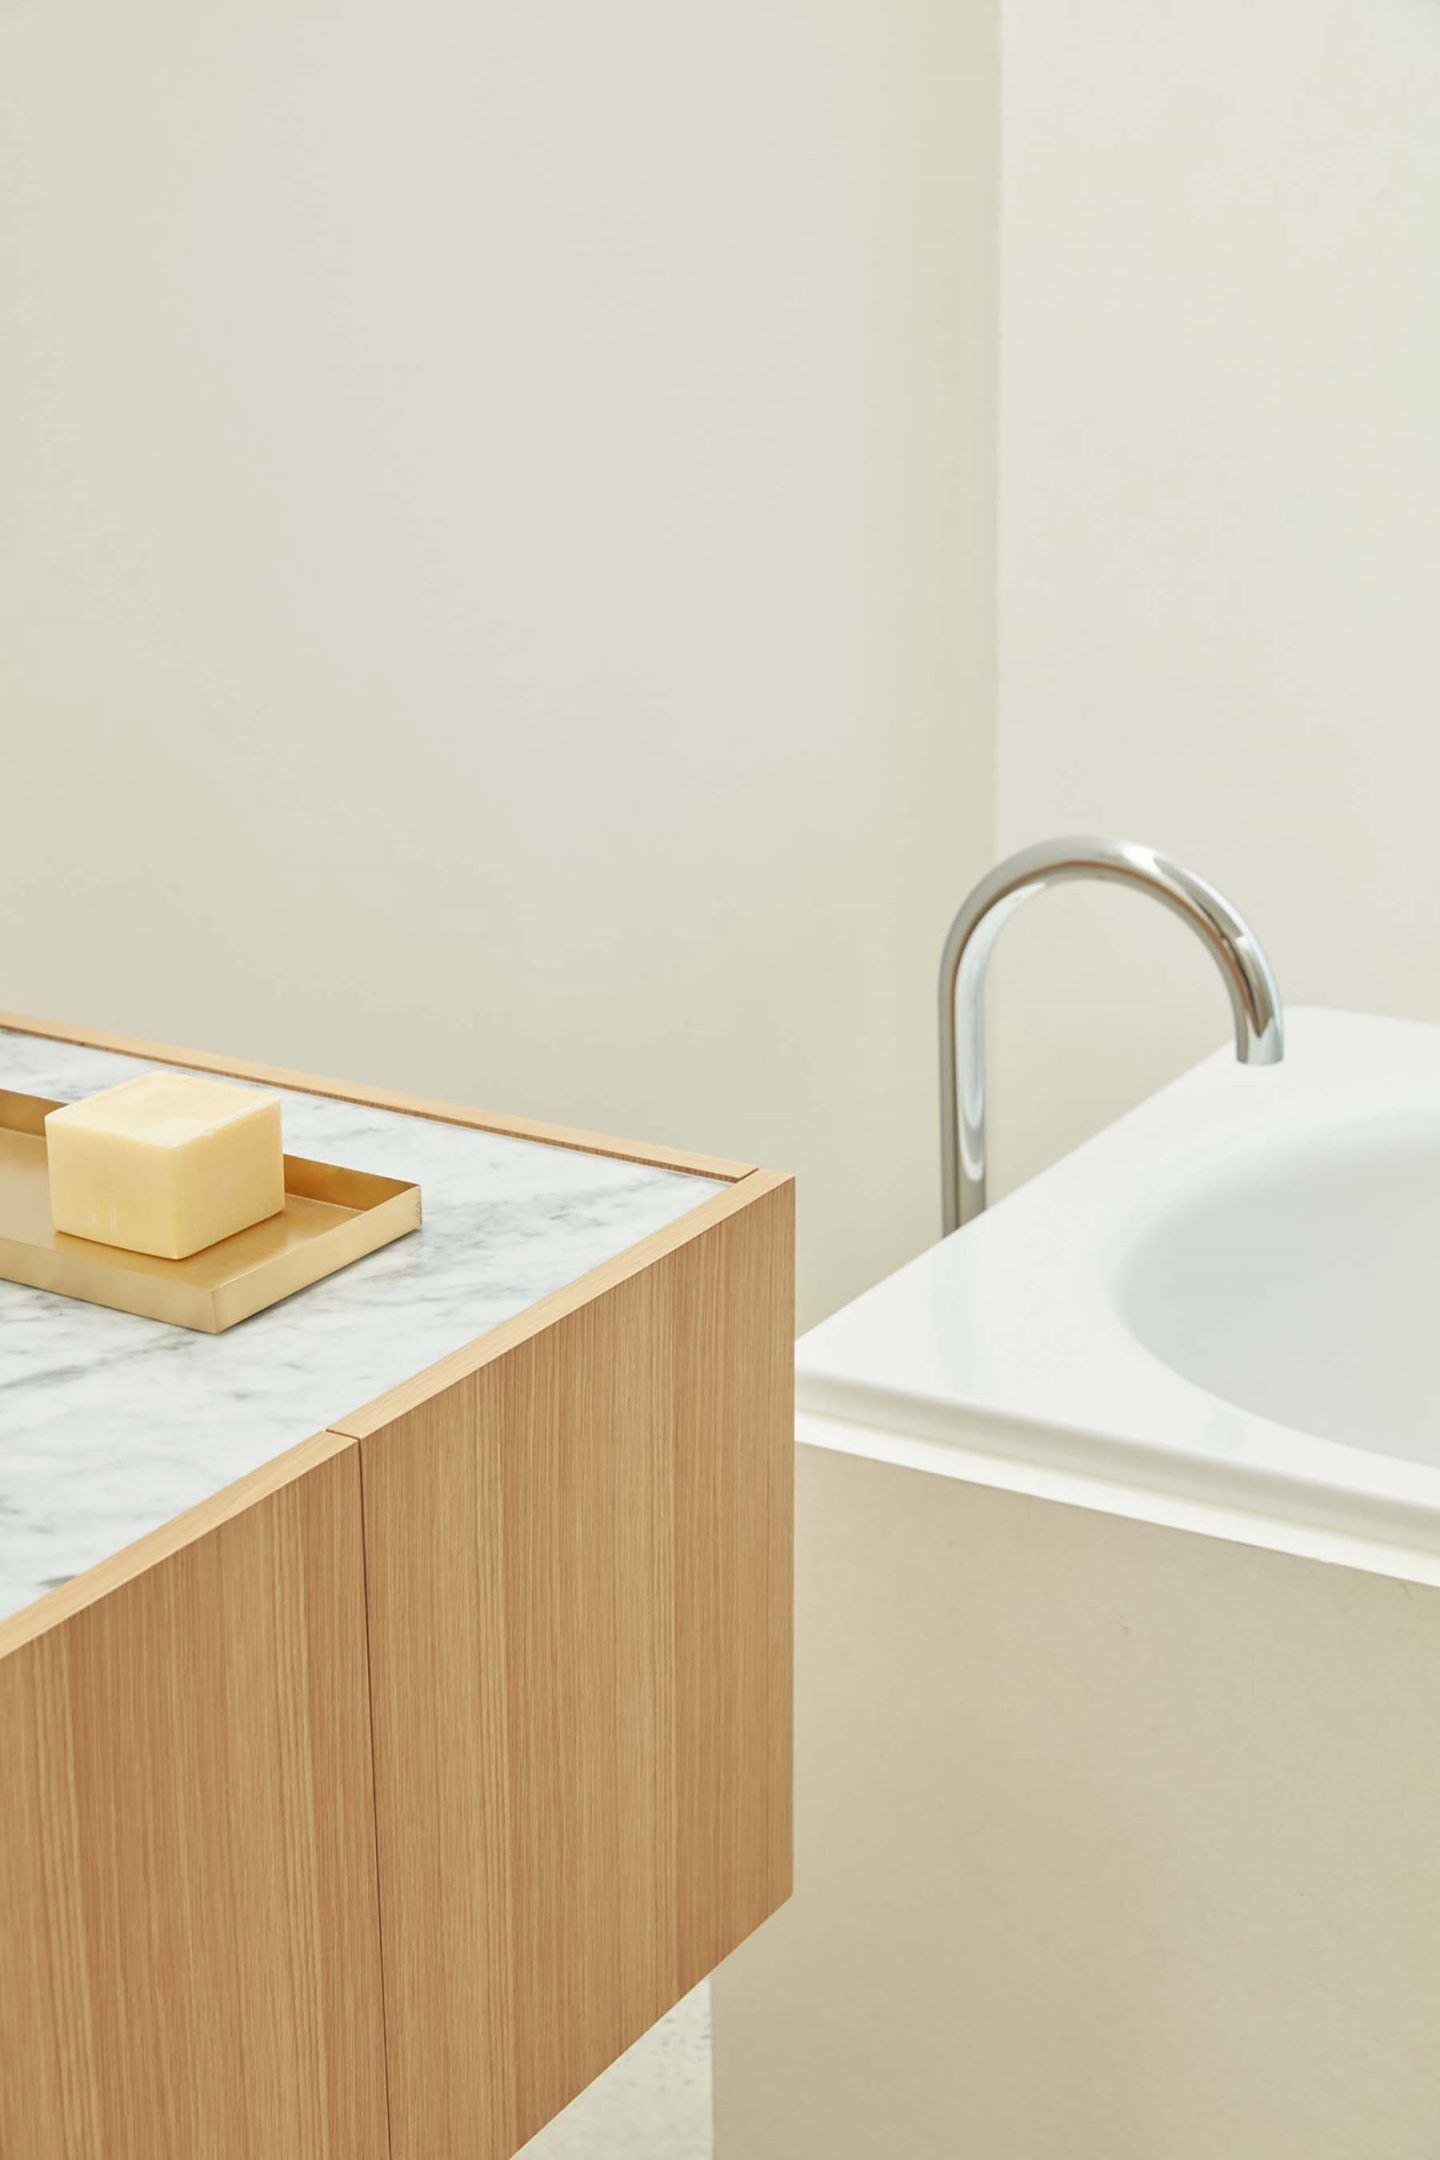 IGNANT-Architecture-Oliver-du-Puy-Architects-Skinny-House-3